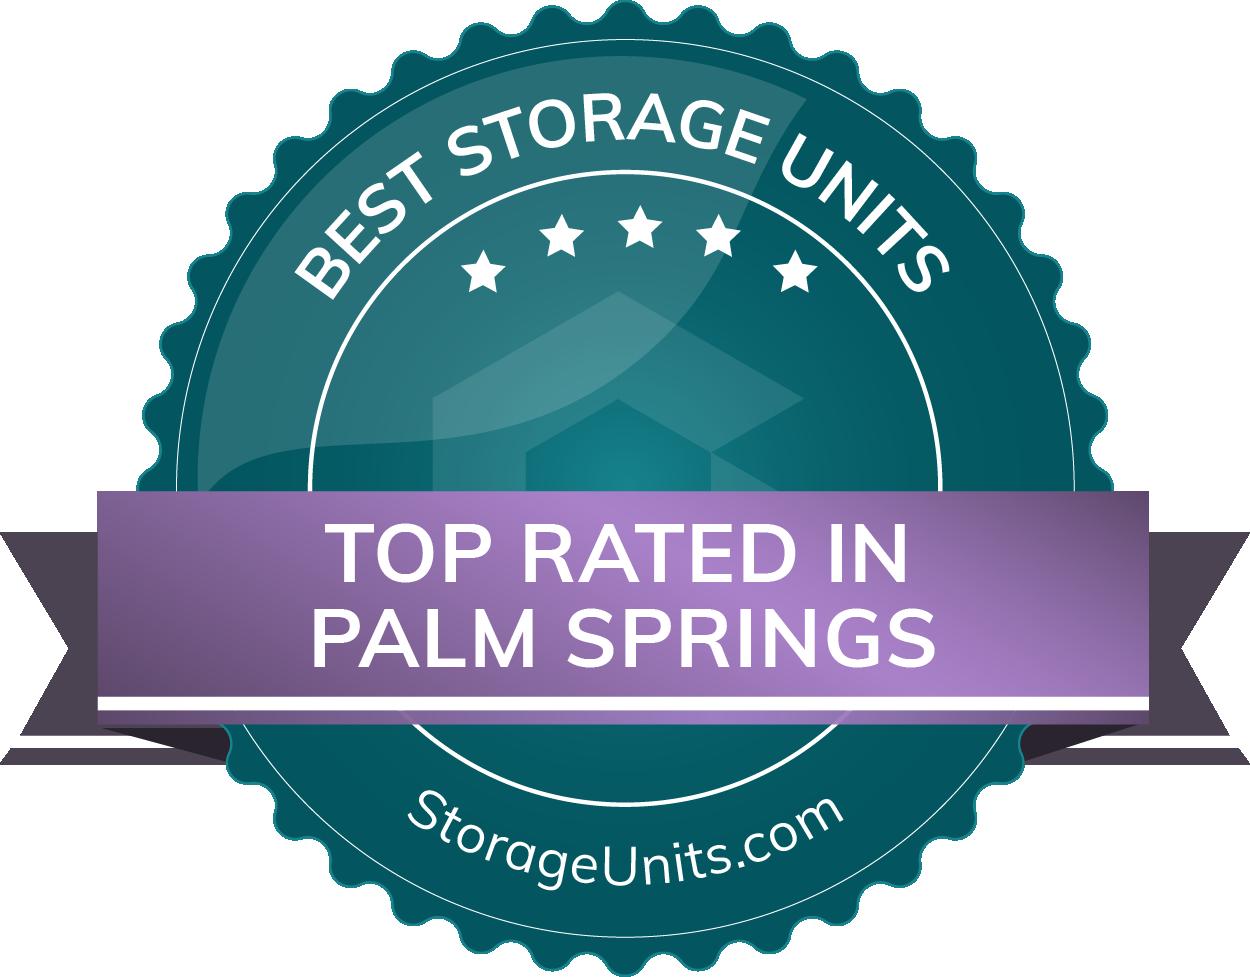 Best Self Storage Units in Palm Springs, CA